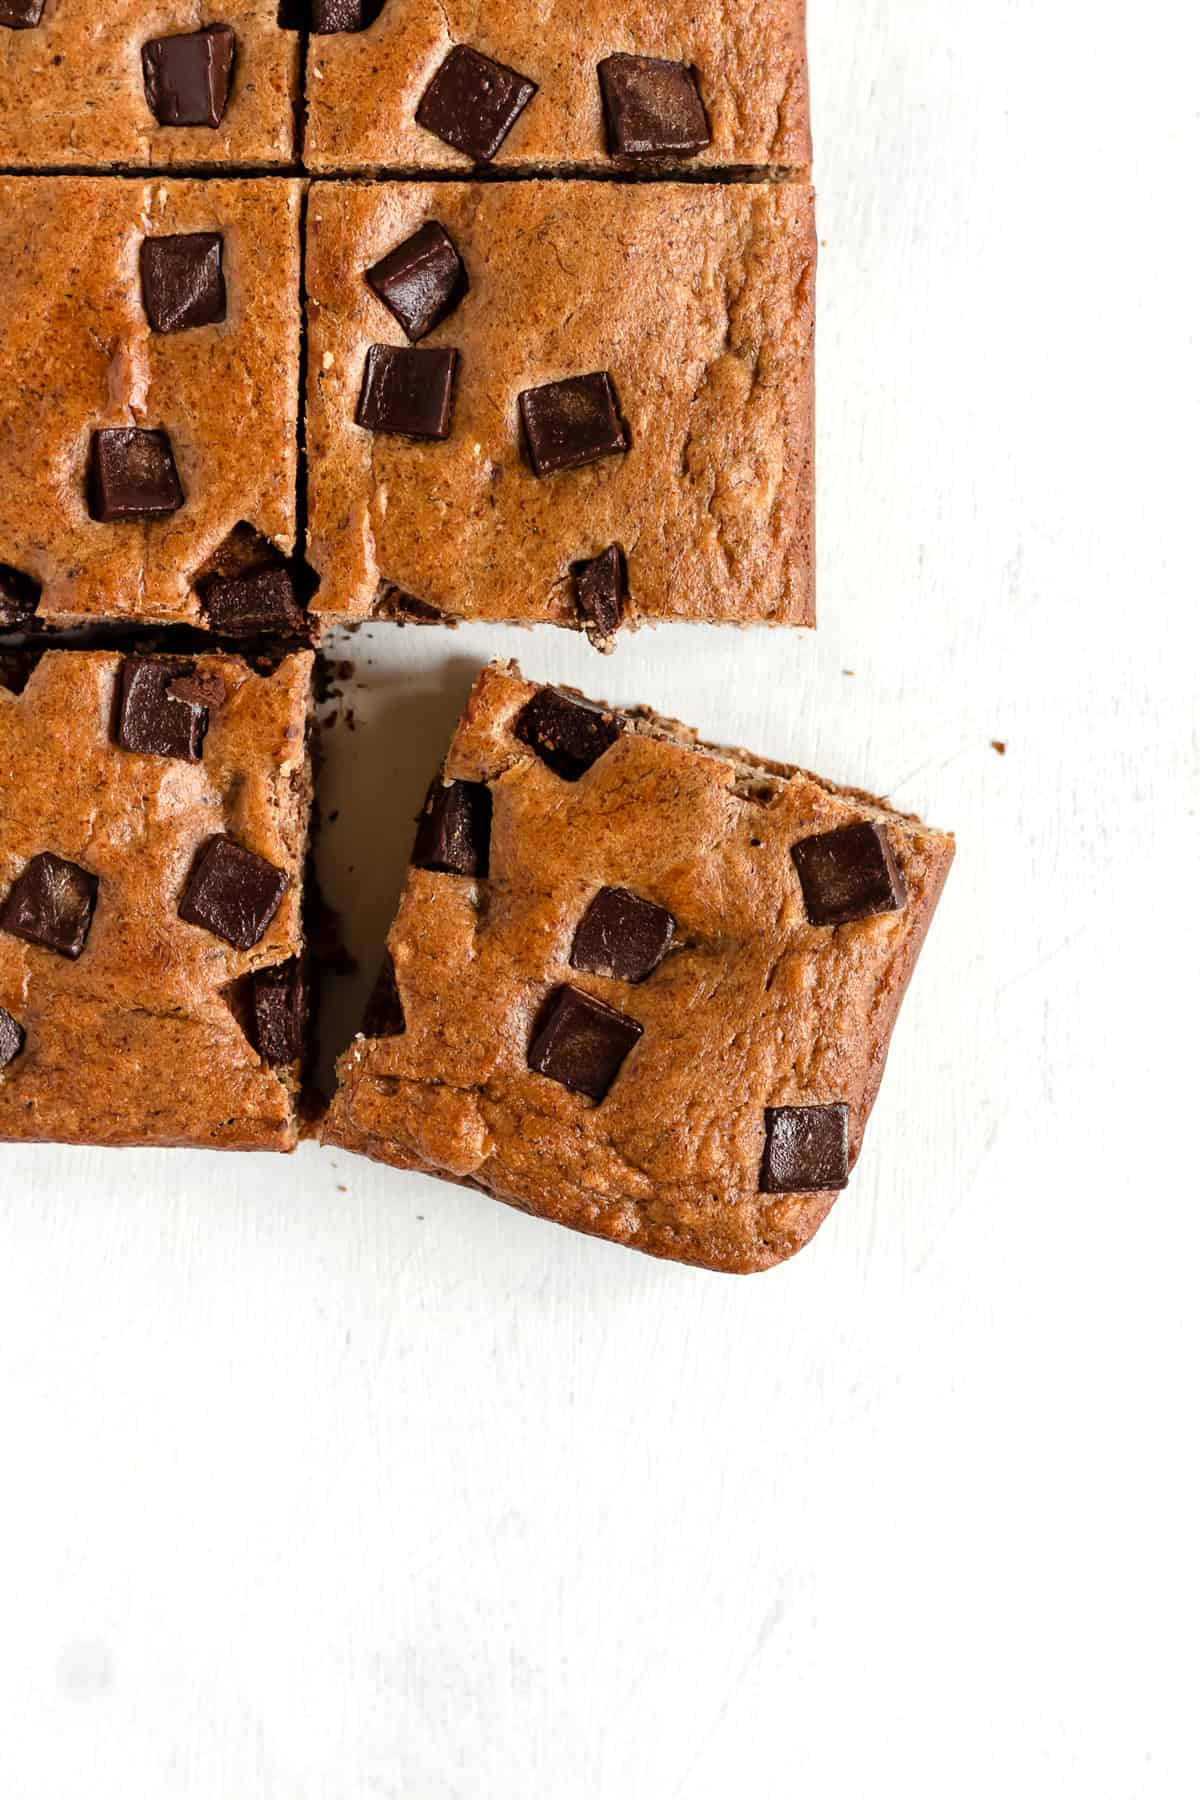 Paleo Chocolate Chunk Banana Bread Bars (gluten free, grain free, dairy free)